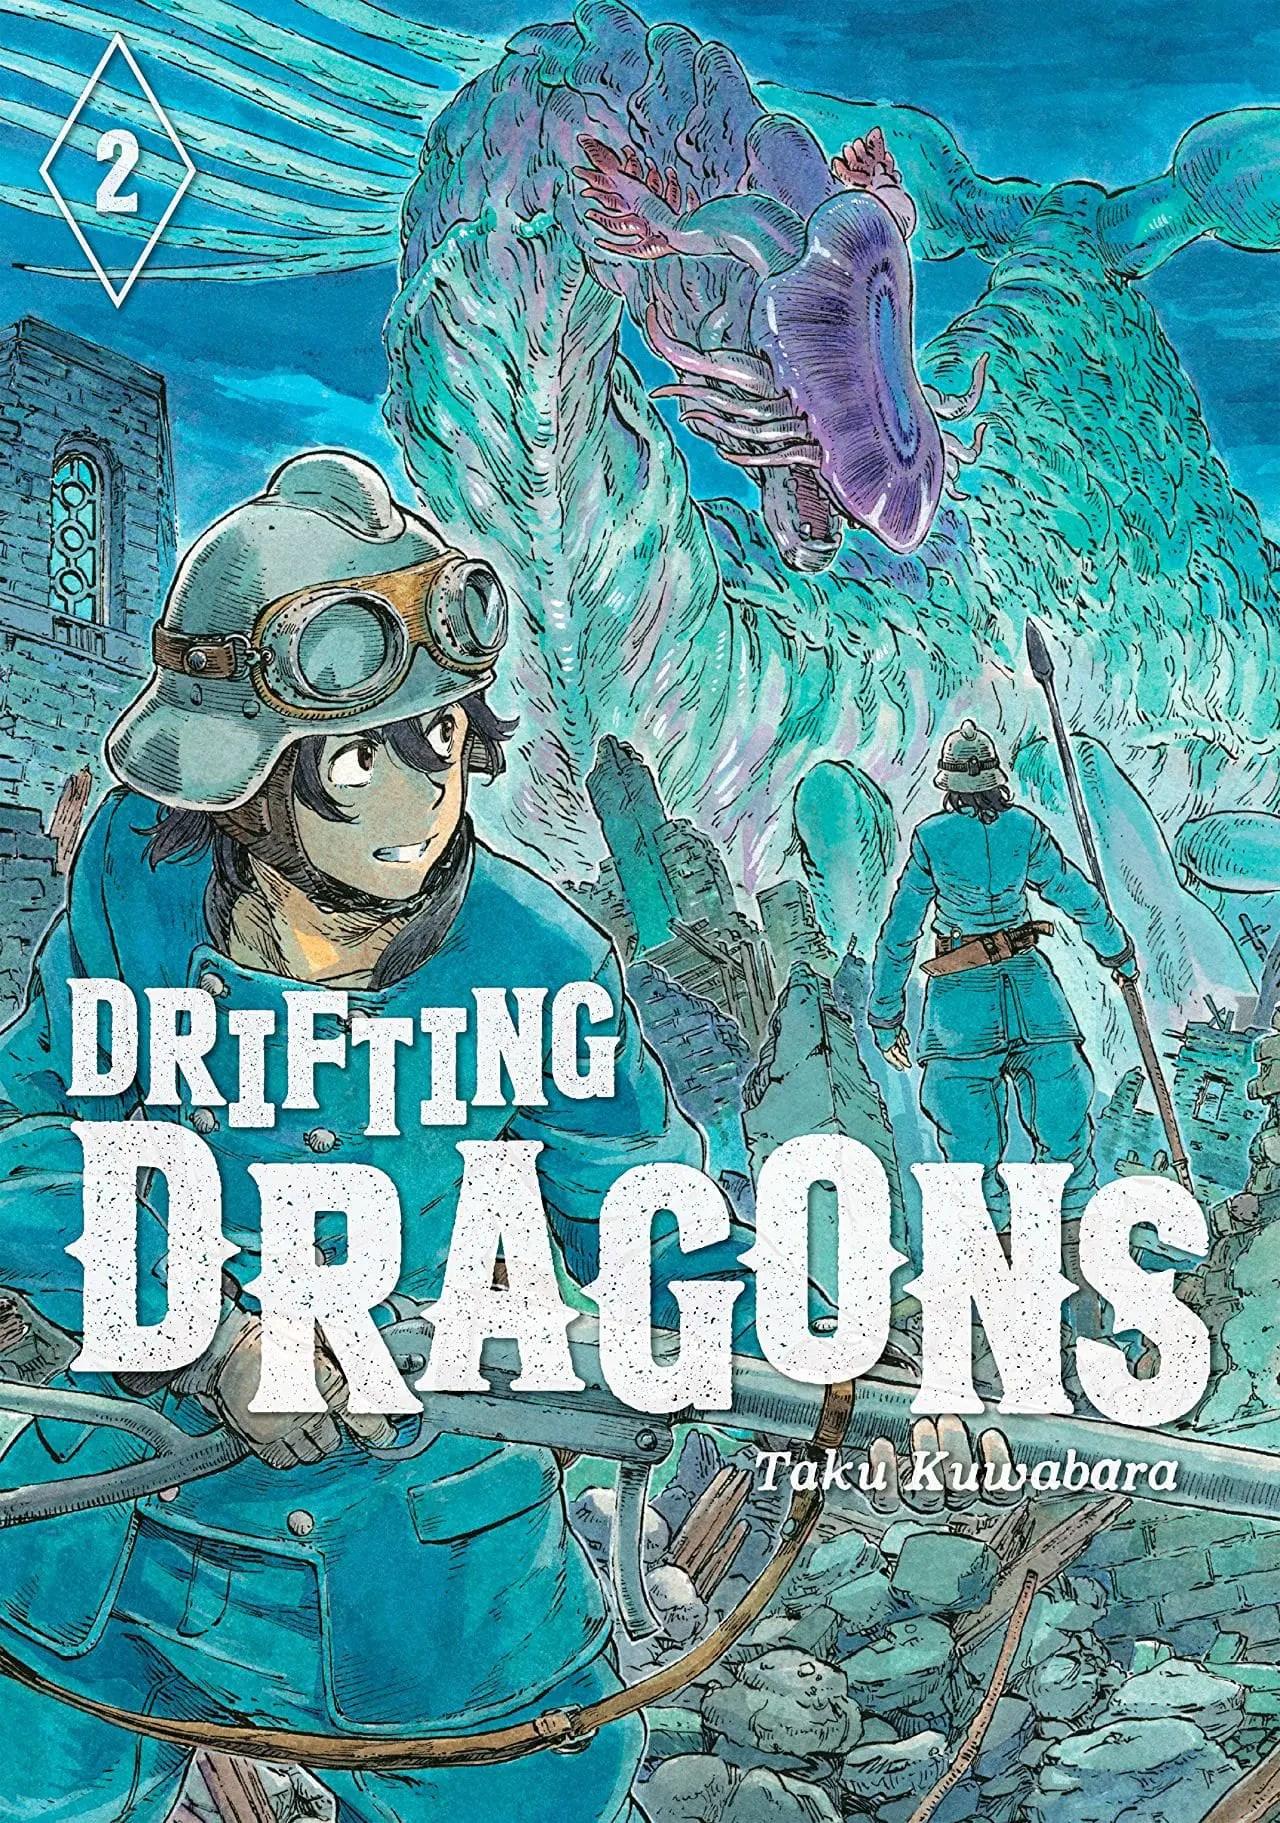 Drifting Dragons Vol. 2 Review